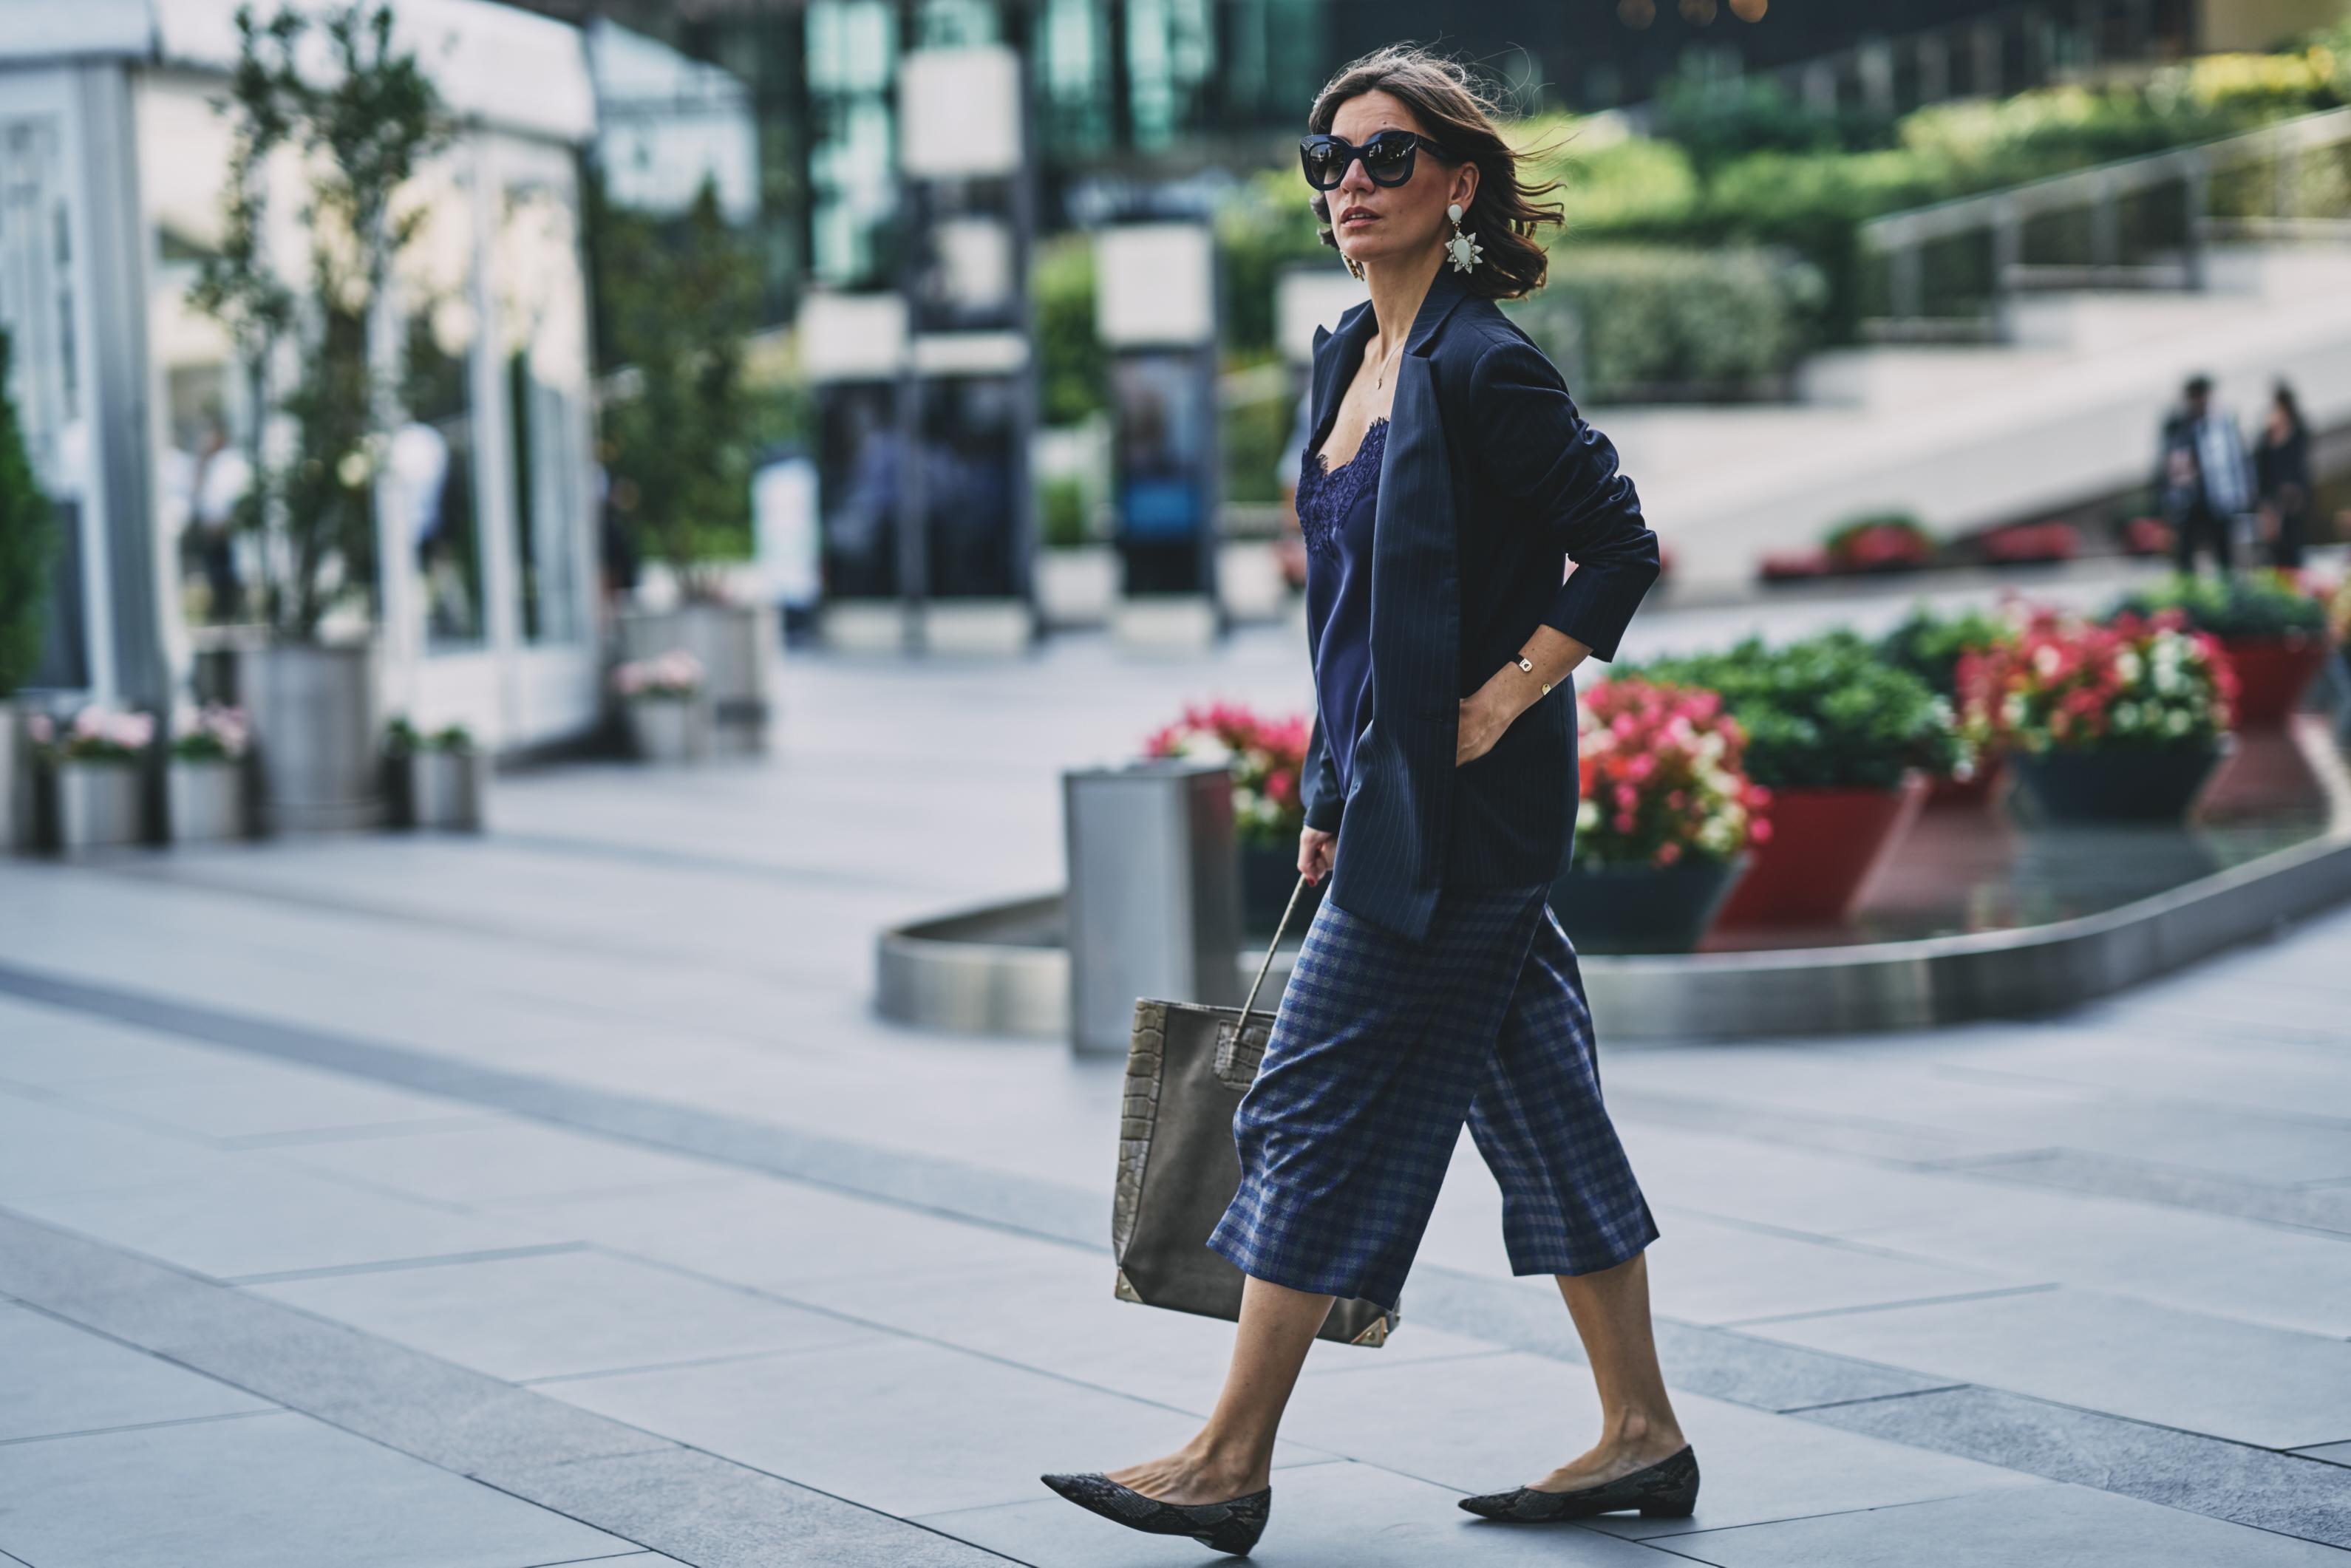 billur saatci, offnegiysem, street style, turkish style blogger, mbfwi, mercedes-benz fashion week istanbul, istanbul moda haftası, ne giydim, ootd, mybestfriends, oscar de la renta, barbara bui, alexander wang, celine